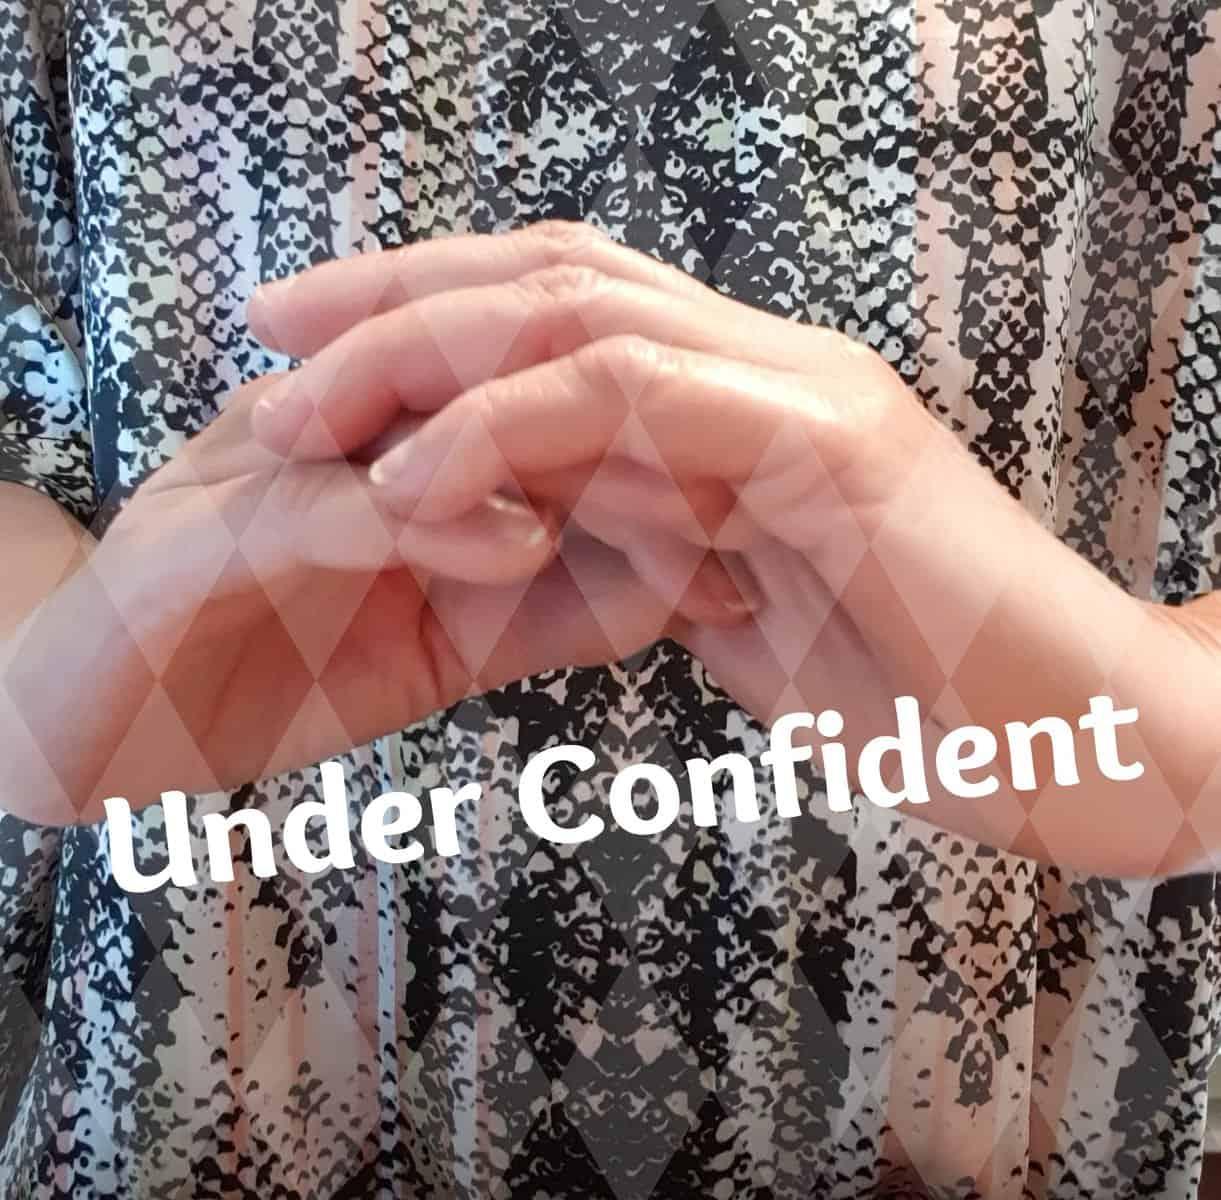 Under confident woman is a label.